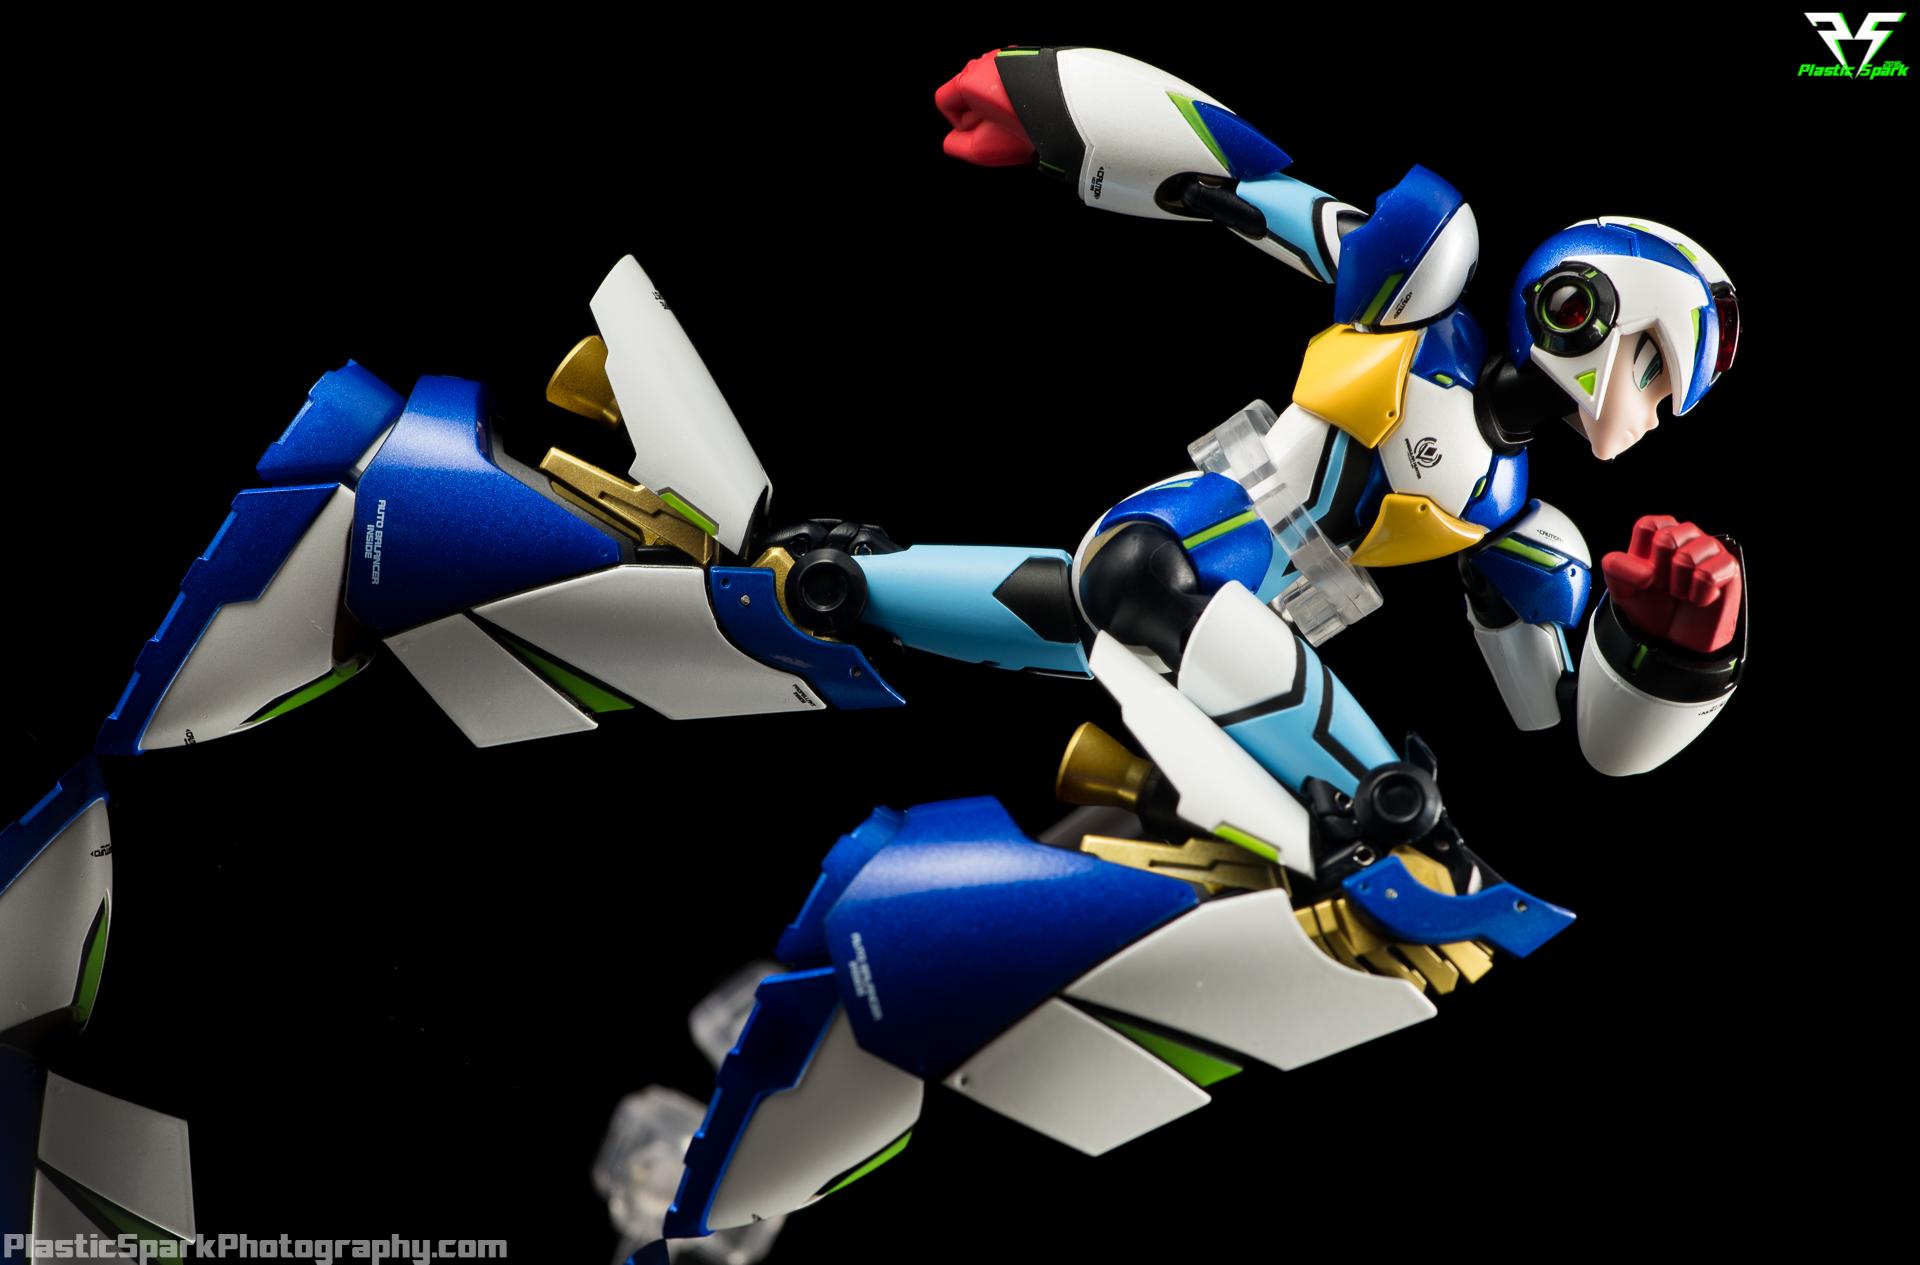 Truforce-Megaman-X-Boost-(4-of-17).png